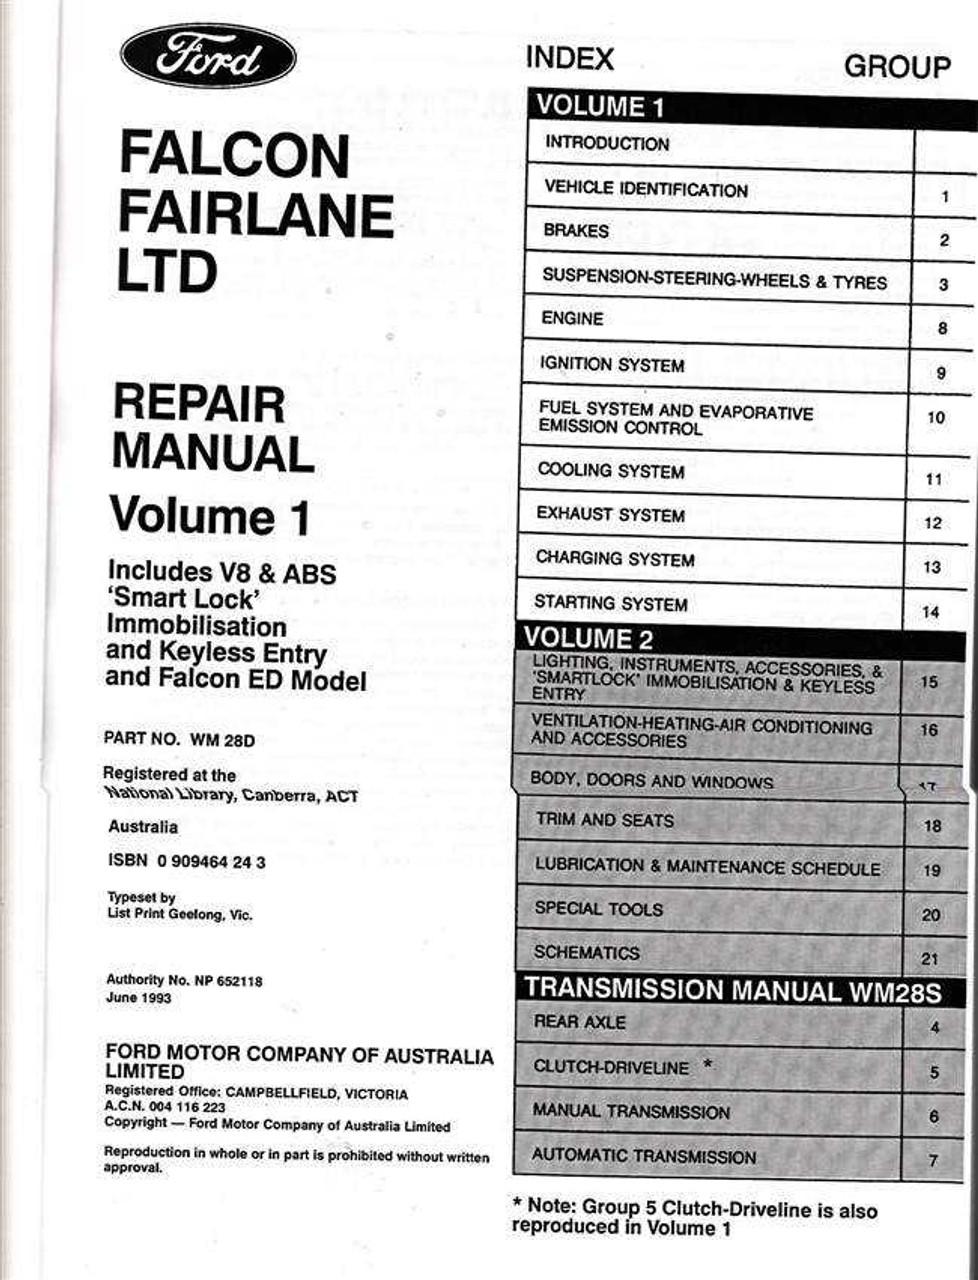 ford falcon and fairlane ltd workshop manual